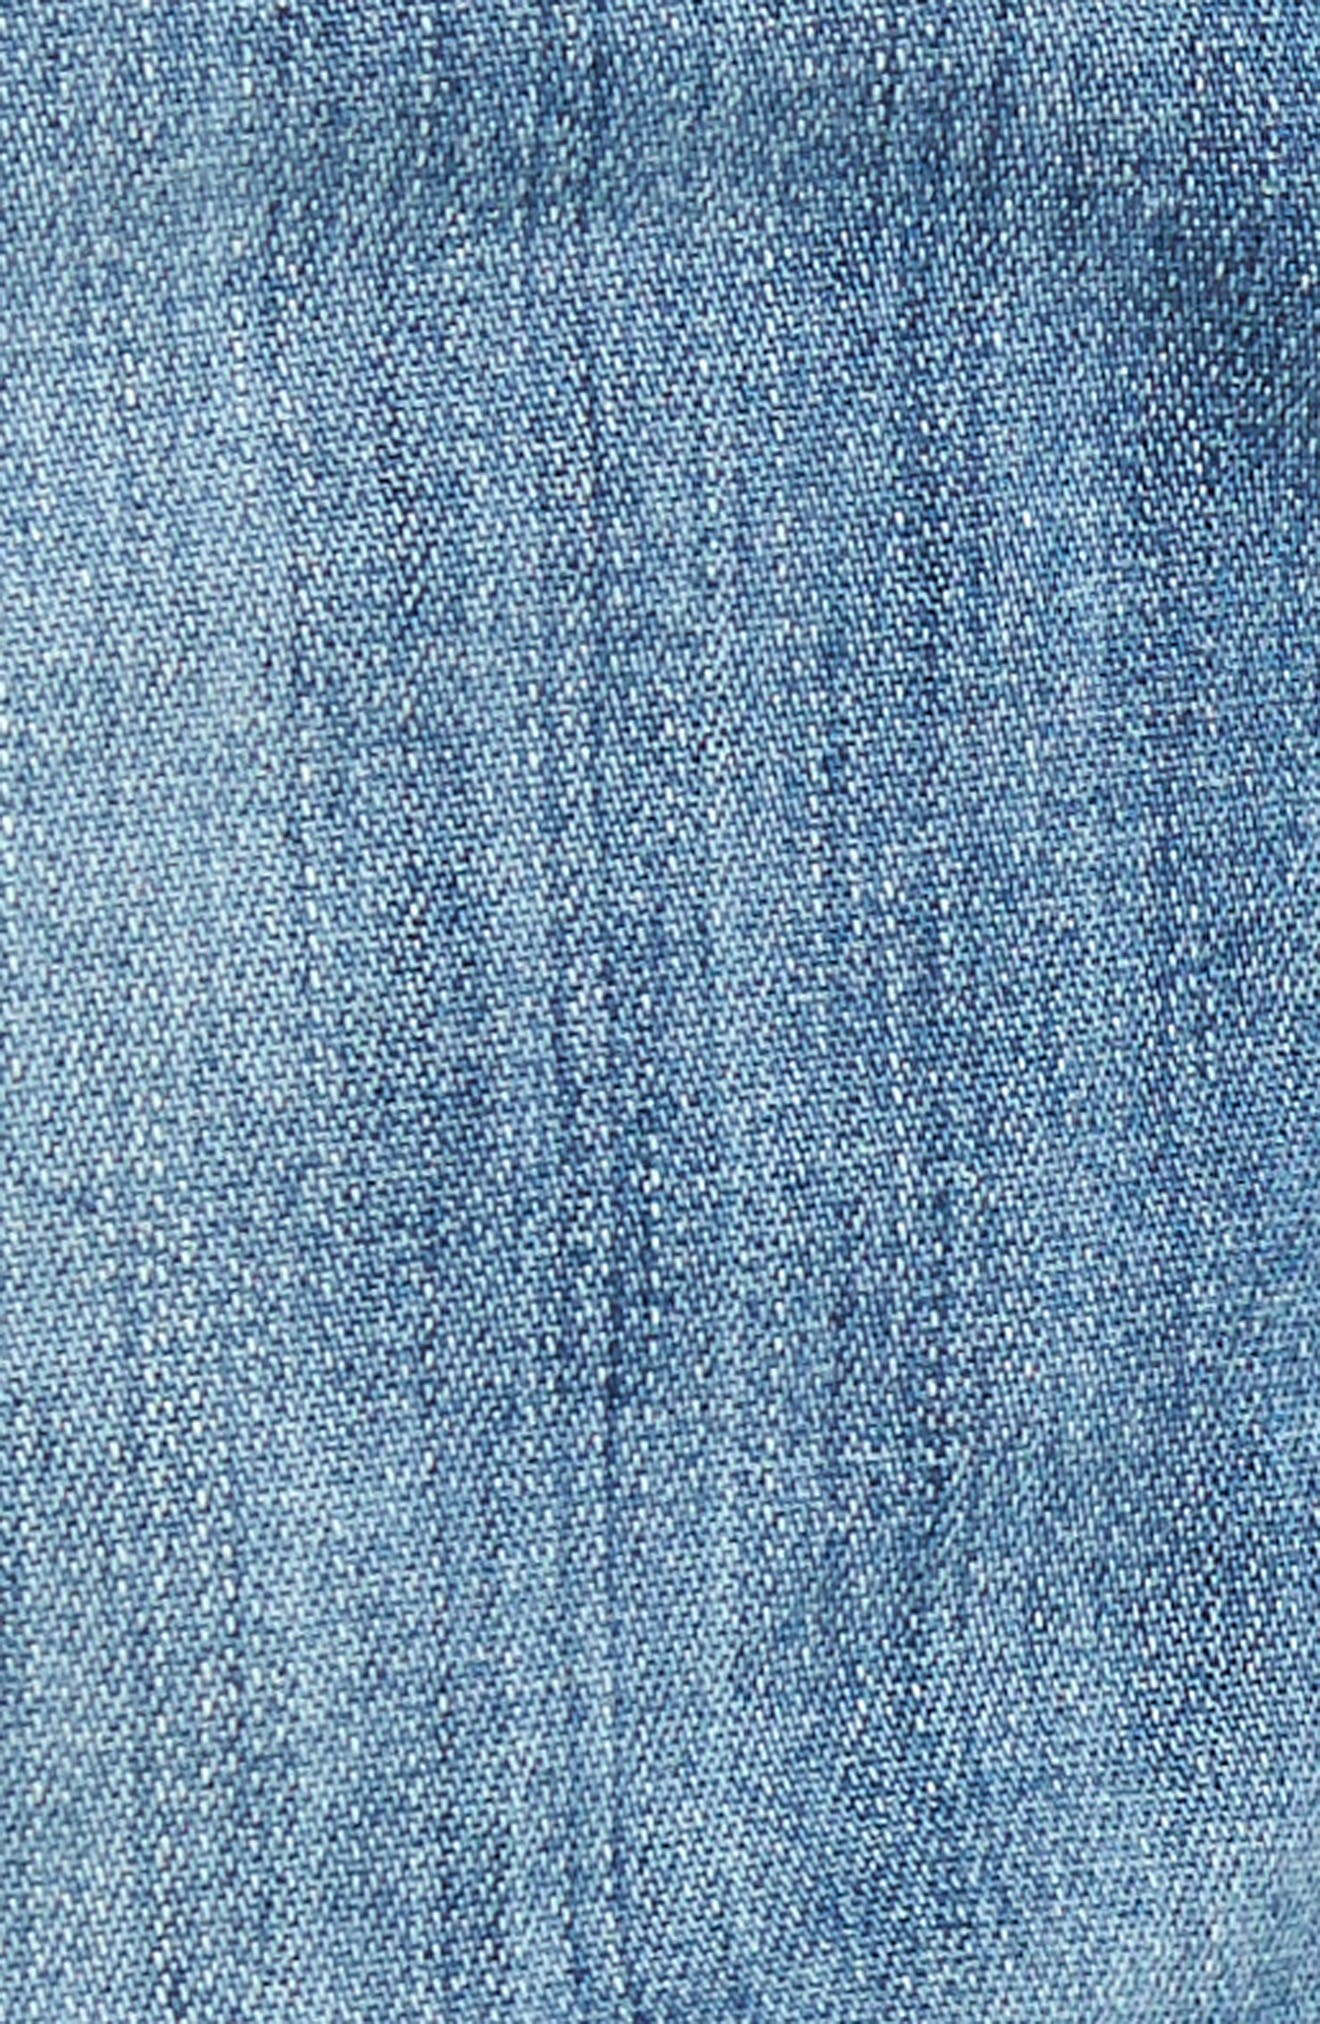 Skyler Denim Shorts,                             Alternate thumbnail 6, color,                             Mercury